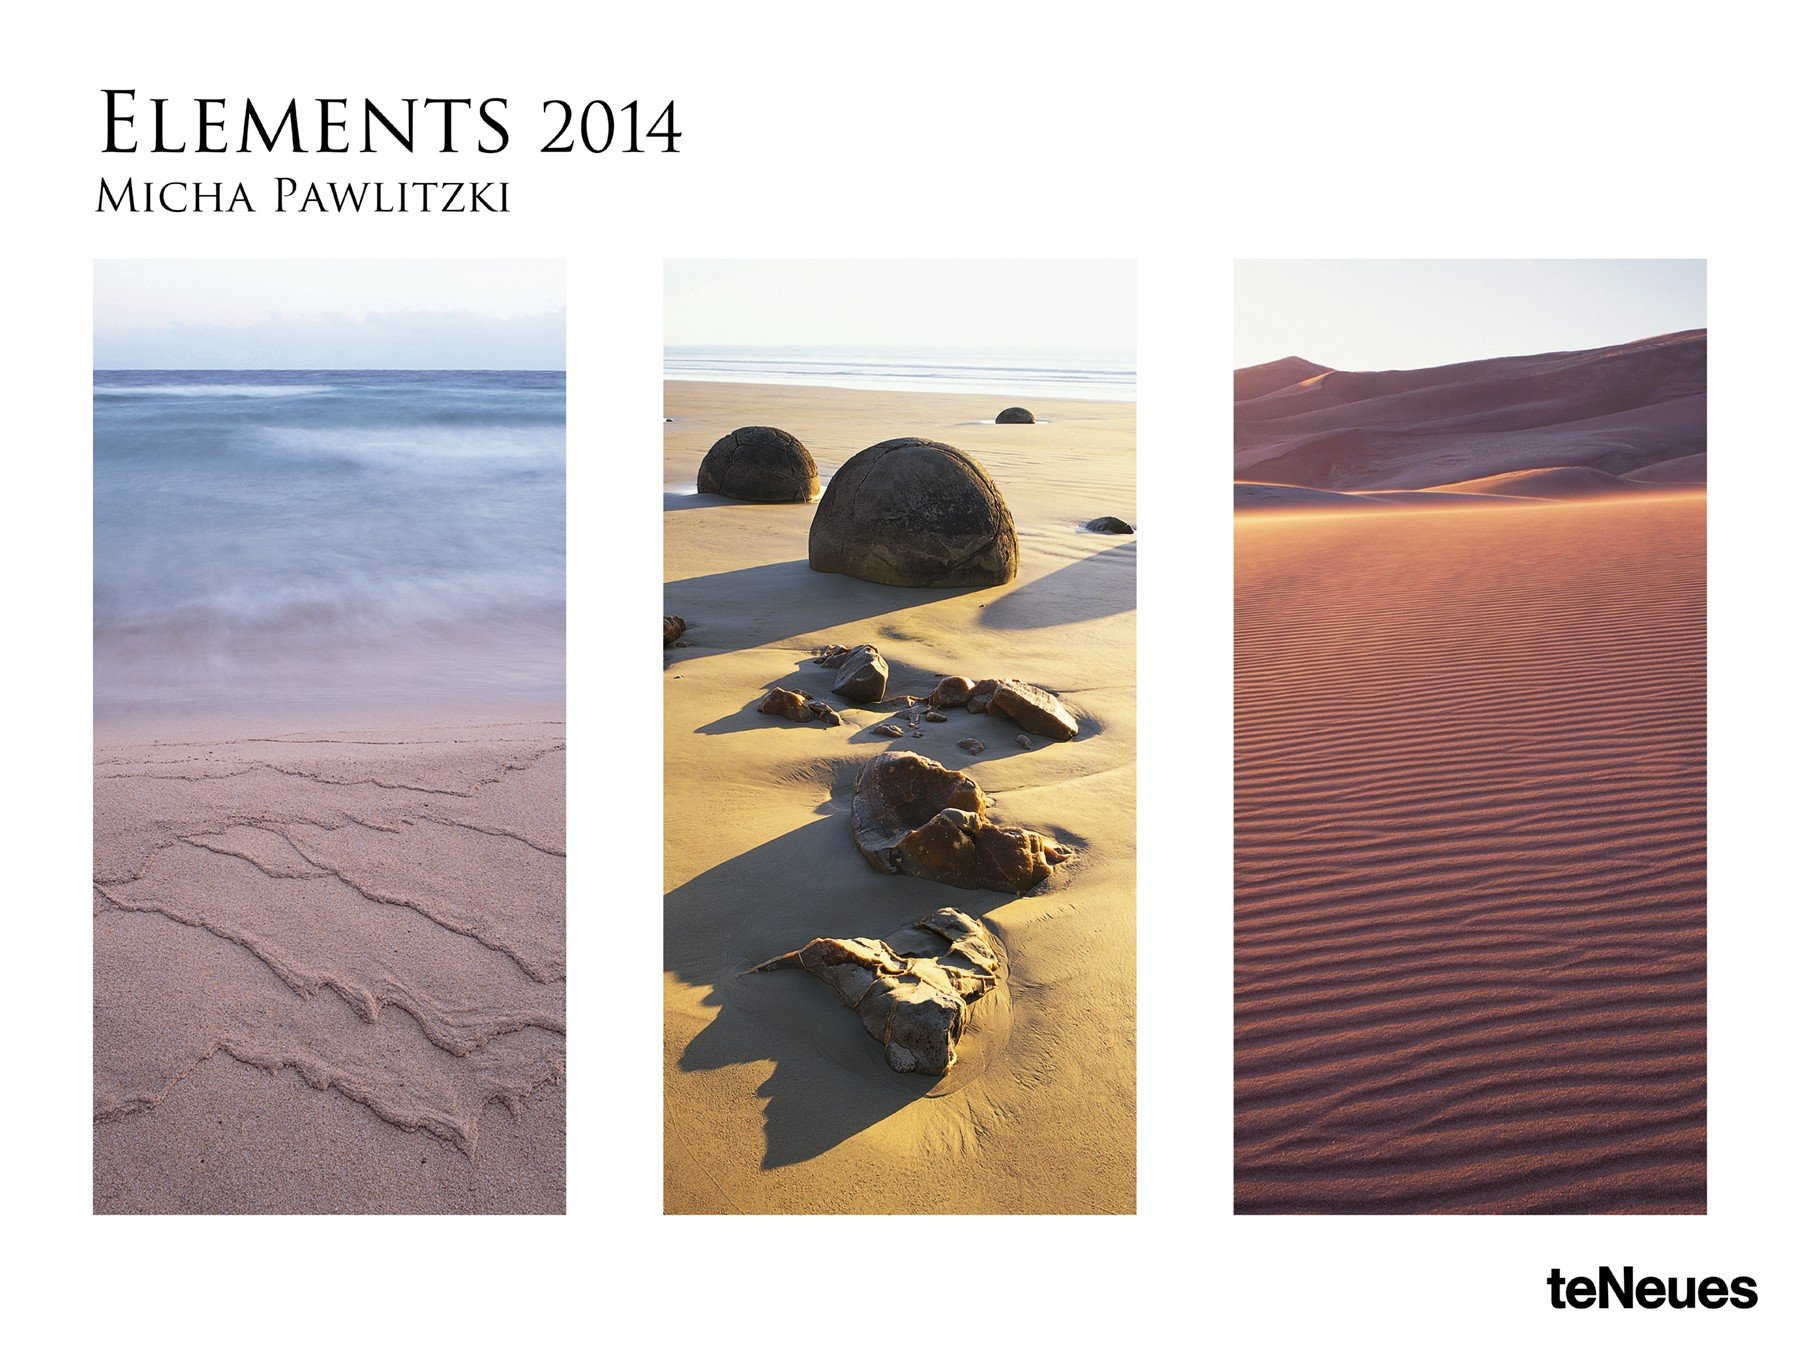 Elements 2014